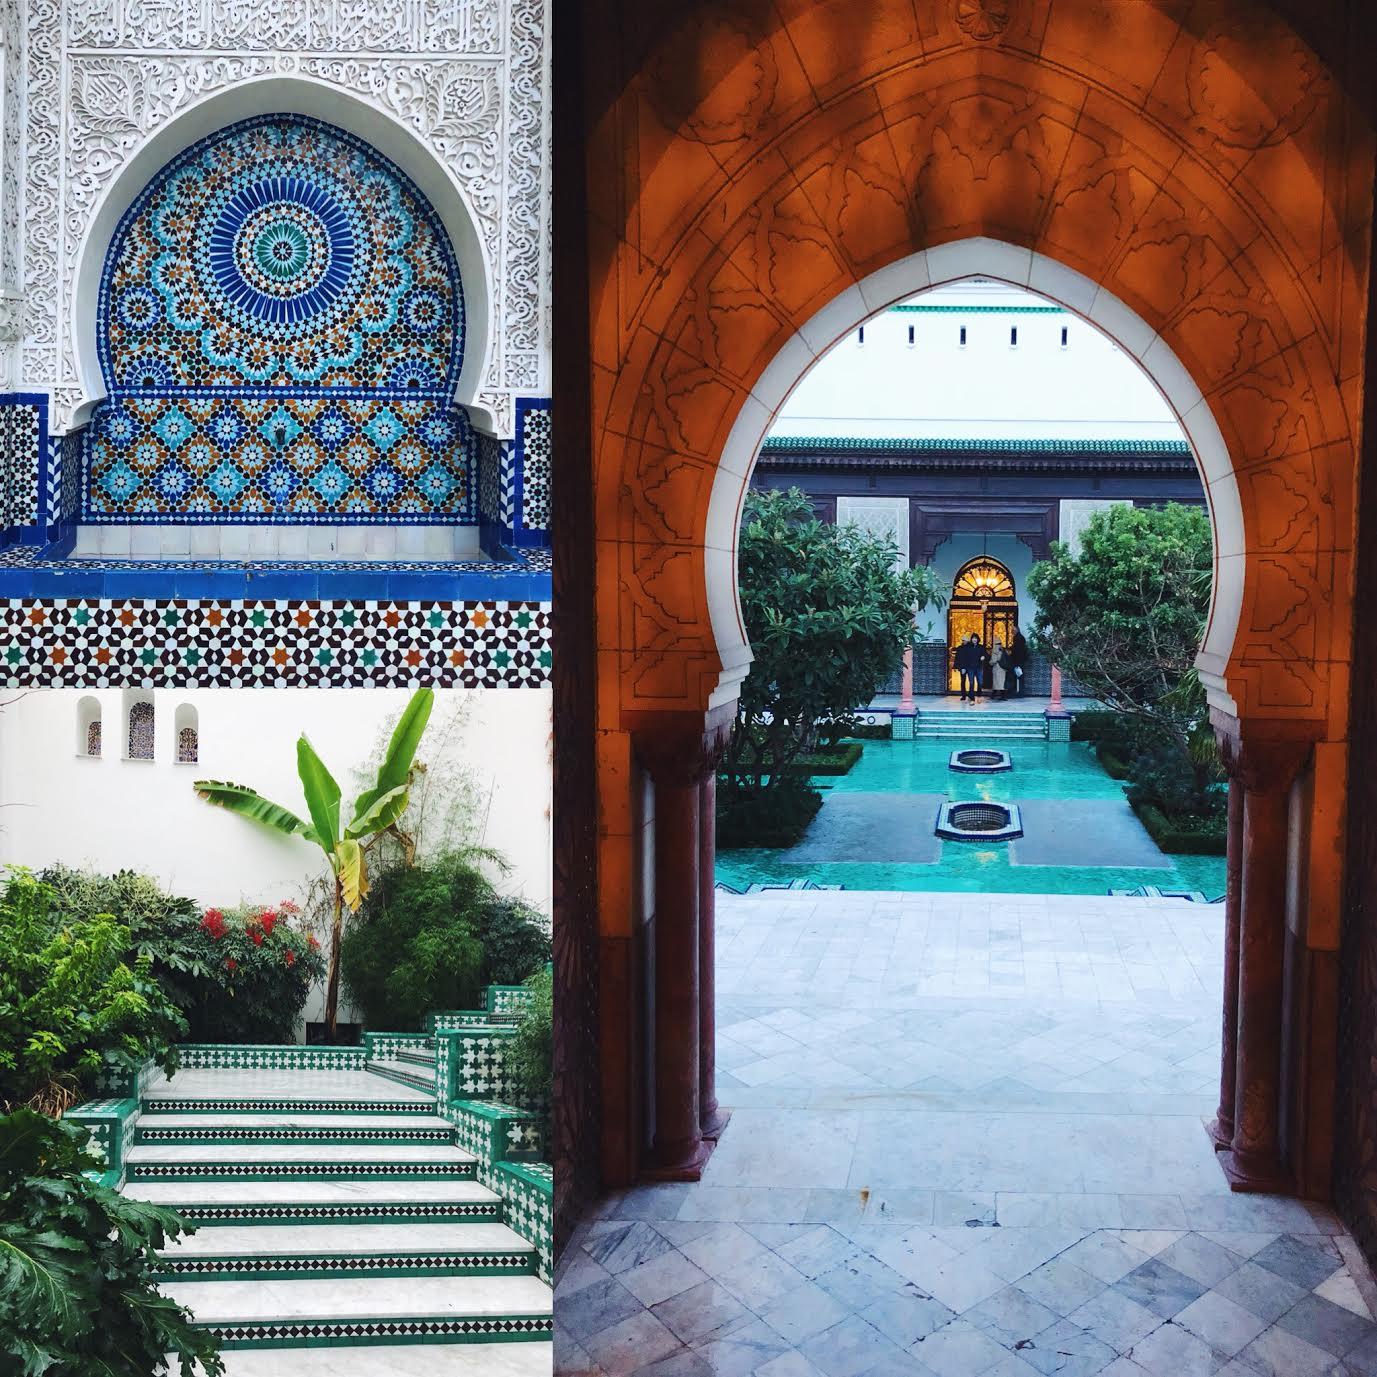 Muslim-travel-guide-Grand-Mosque-of-Paris-courtyard.jpg